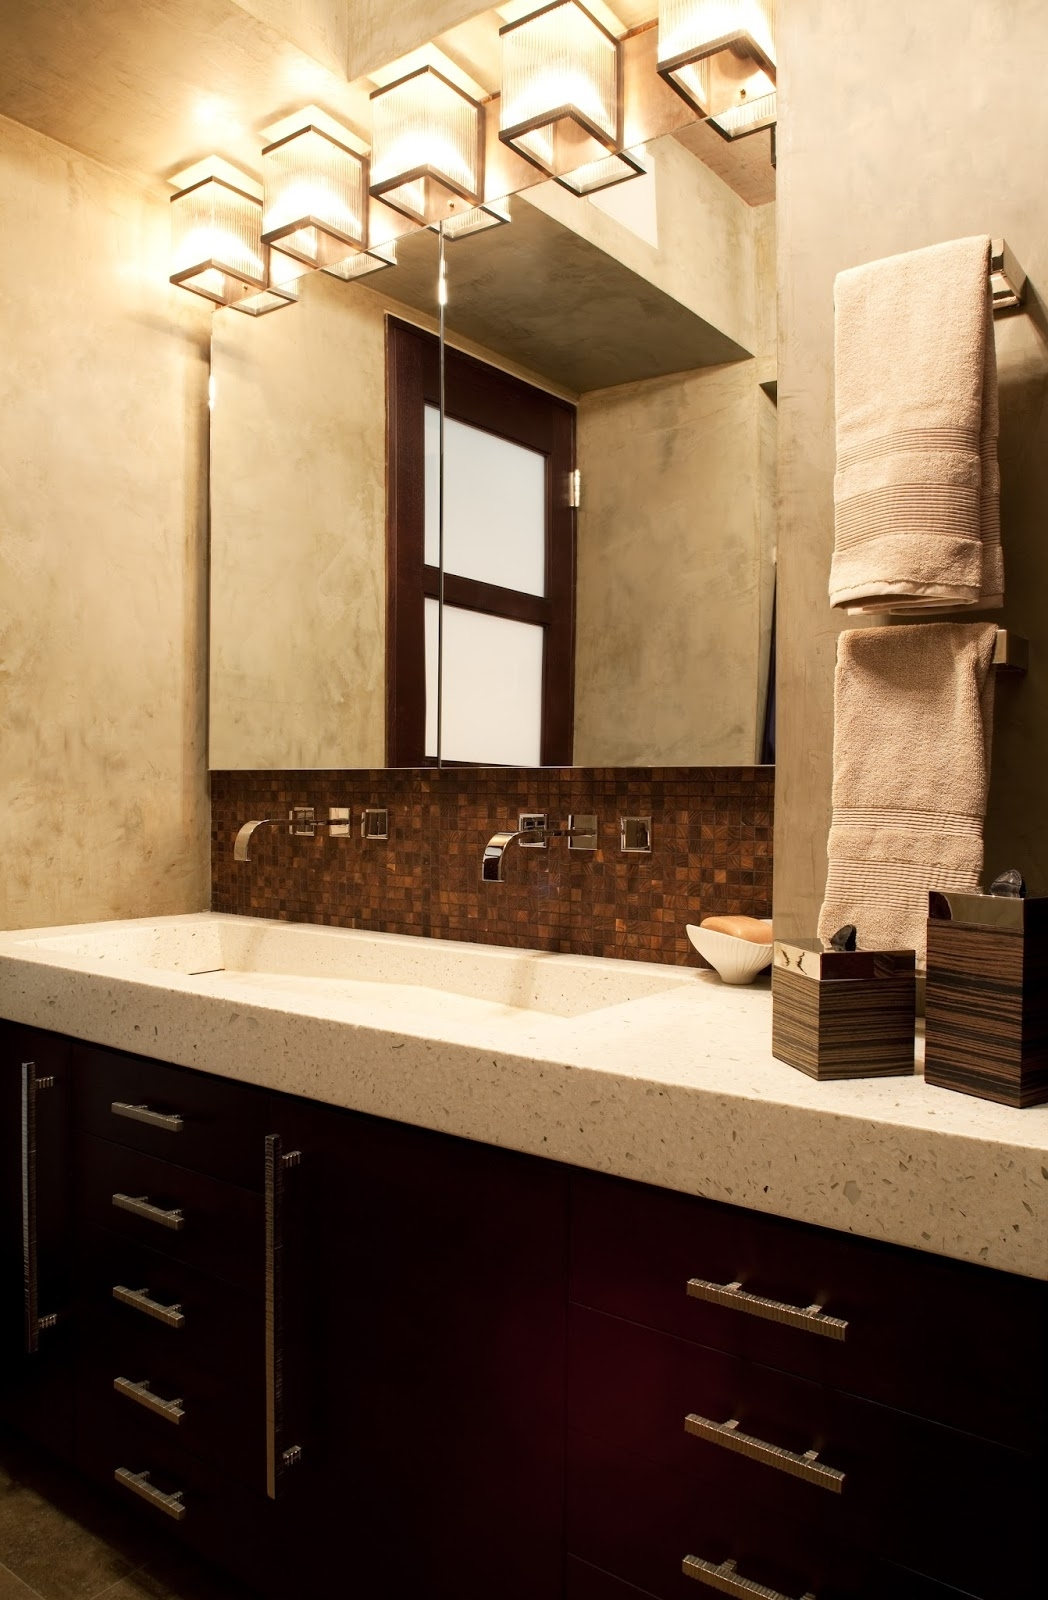 Chandelier Bathroom Vanity Lighting For Favorite Dazzling 3 Light Mini Chandelier 25 Modern Wooden Chandeliers With A (View 2 of 15)